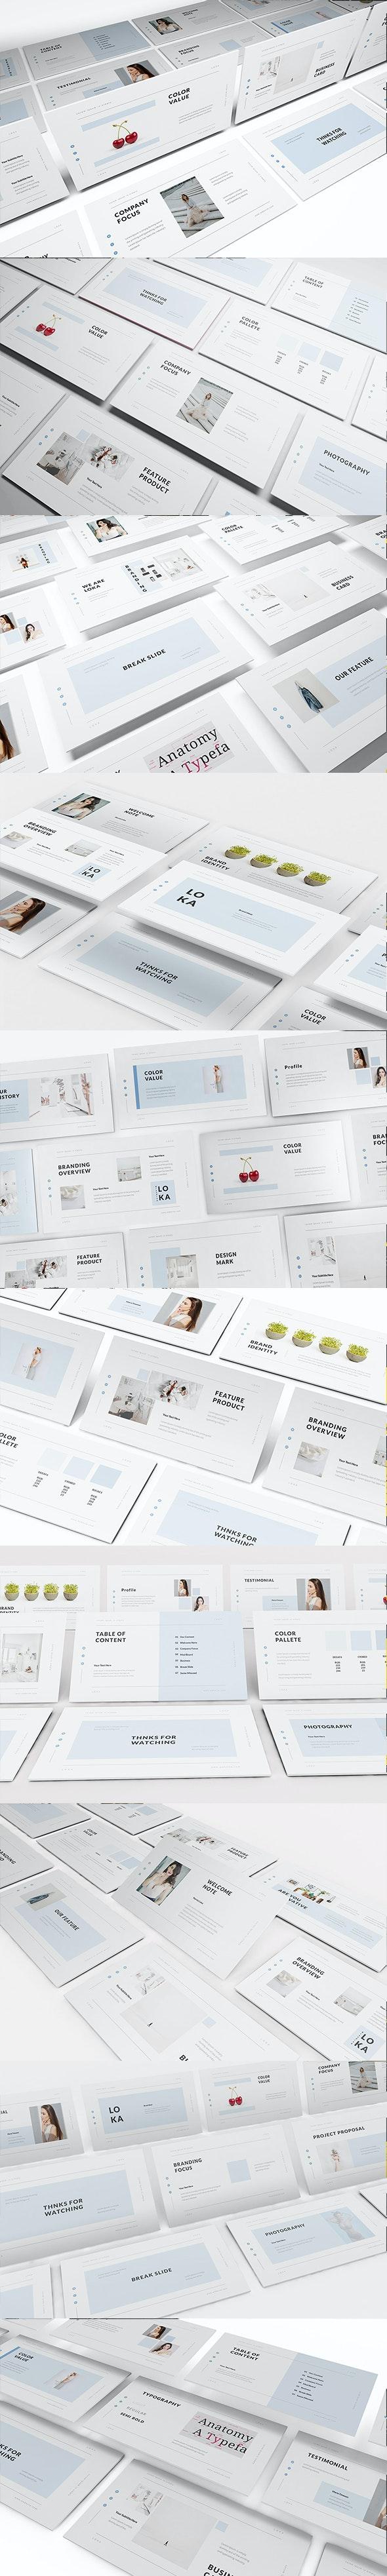 Loka Brand Guideline Keynote Template - Keynote Templates Presentation Templates